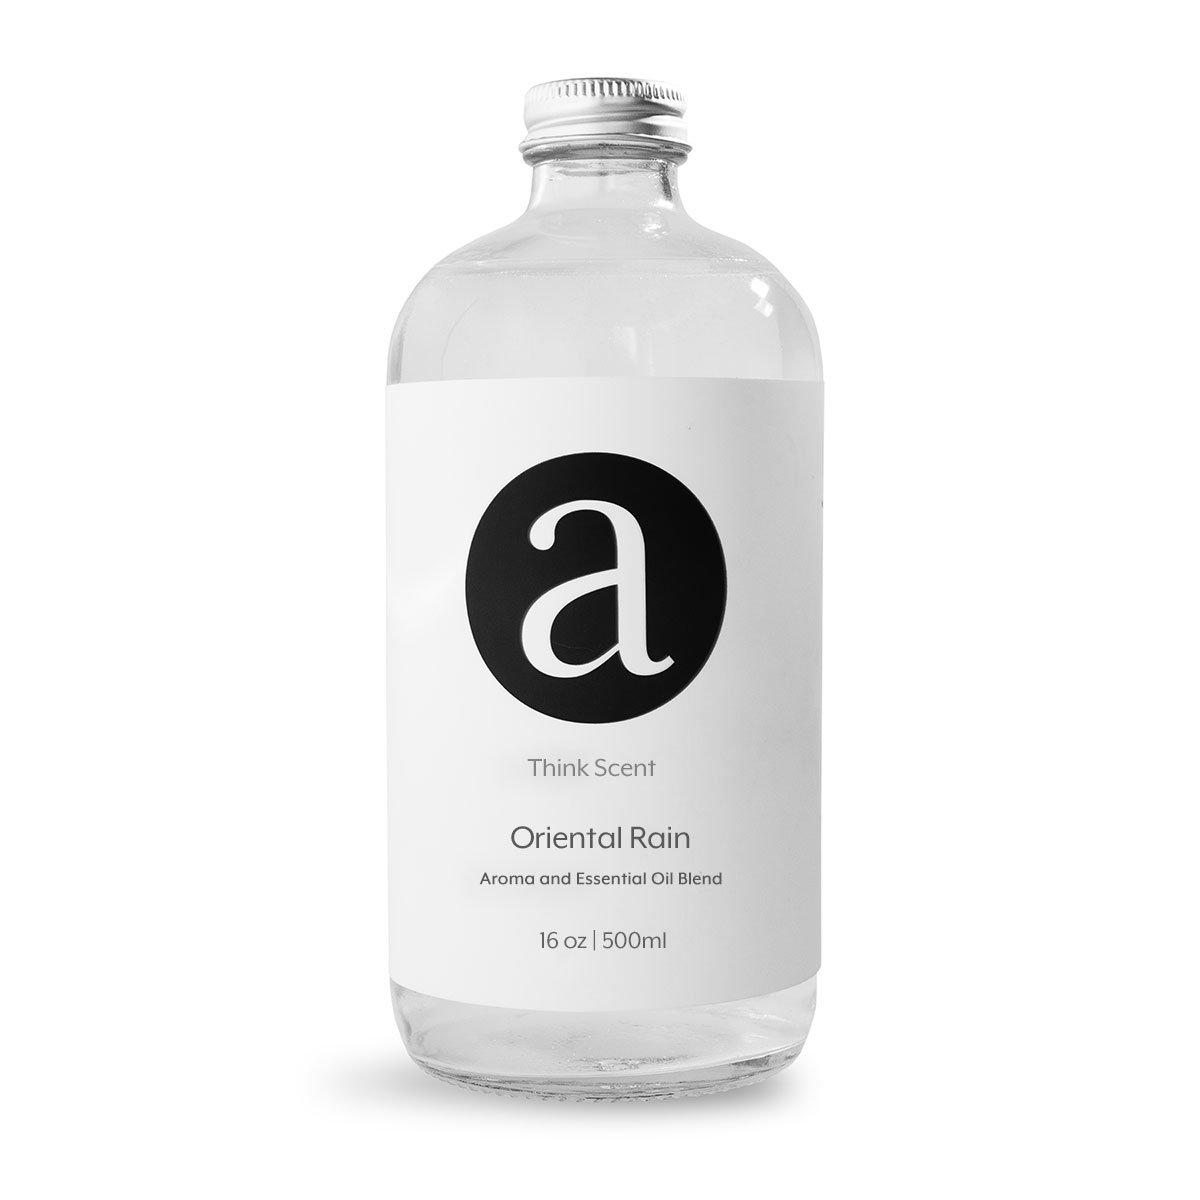 (Oriental Rain) Aroma / Fragrance Oil For AromaTech Air Freshener Scent Diffuser (Half Gallon)